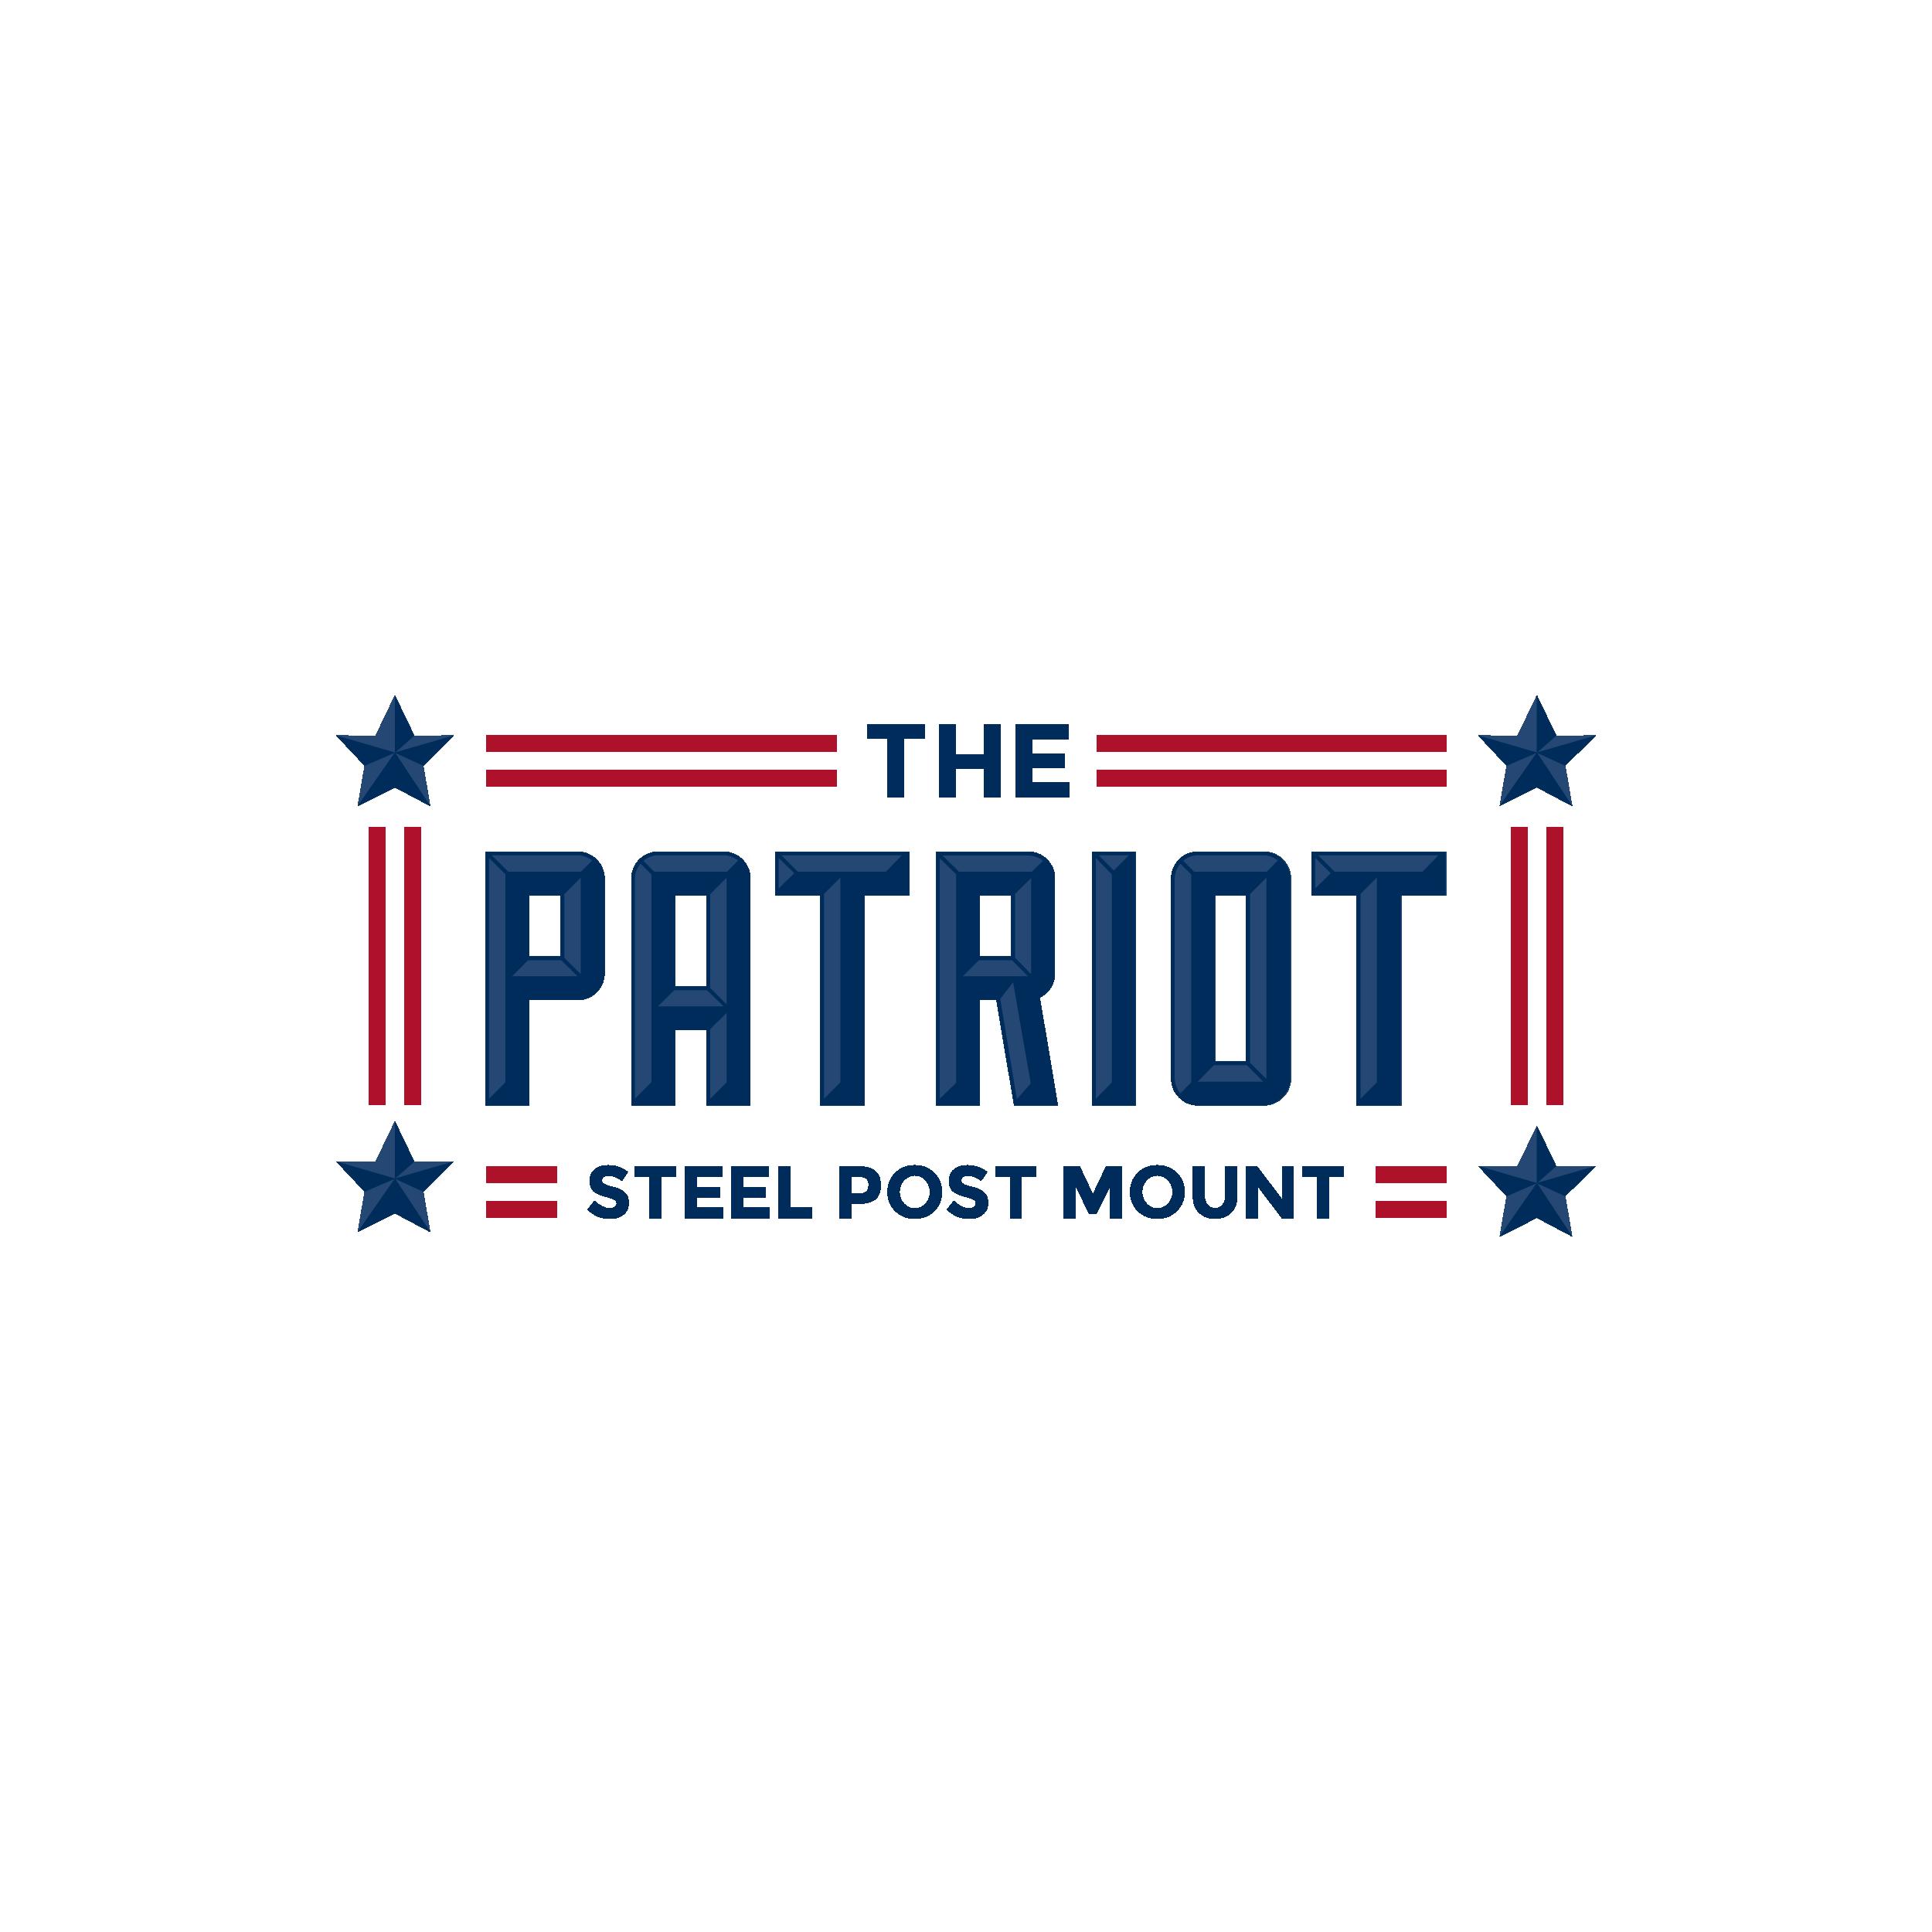 The Patriot Steel Post Mount